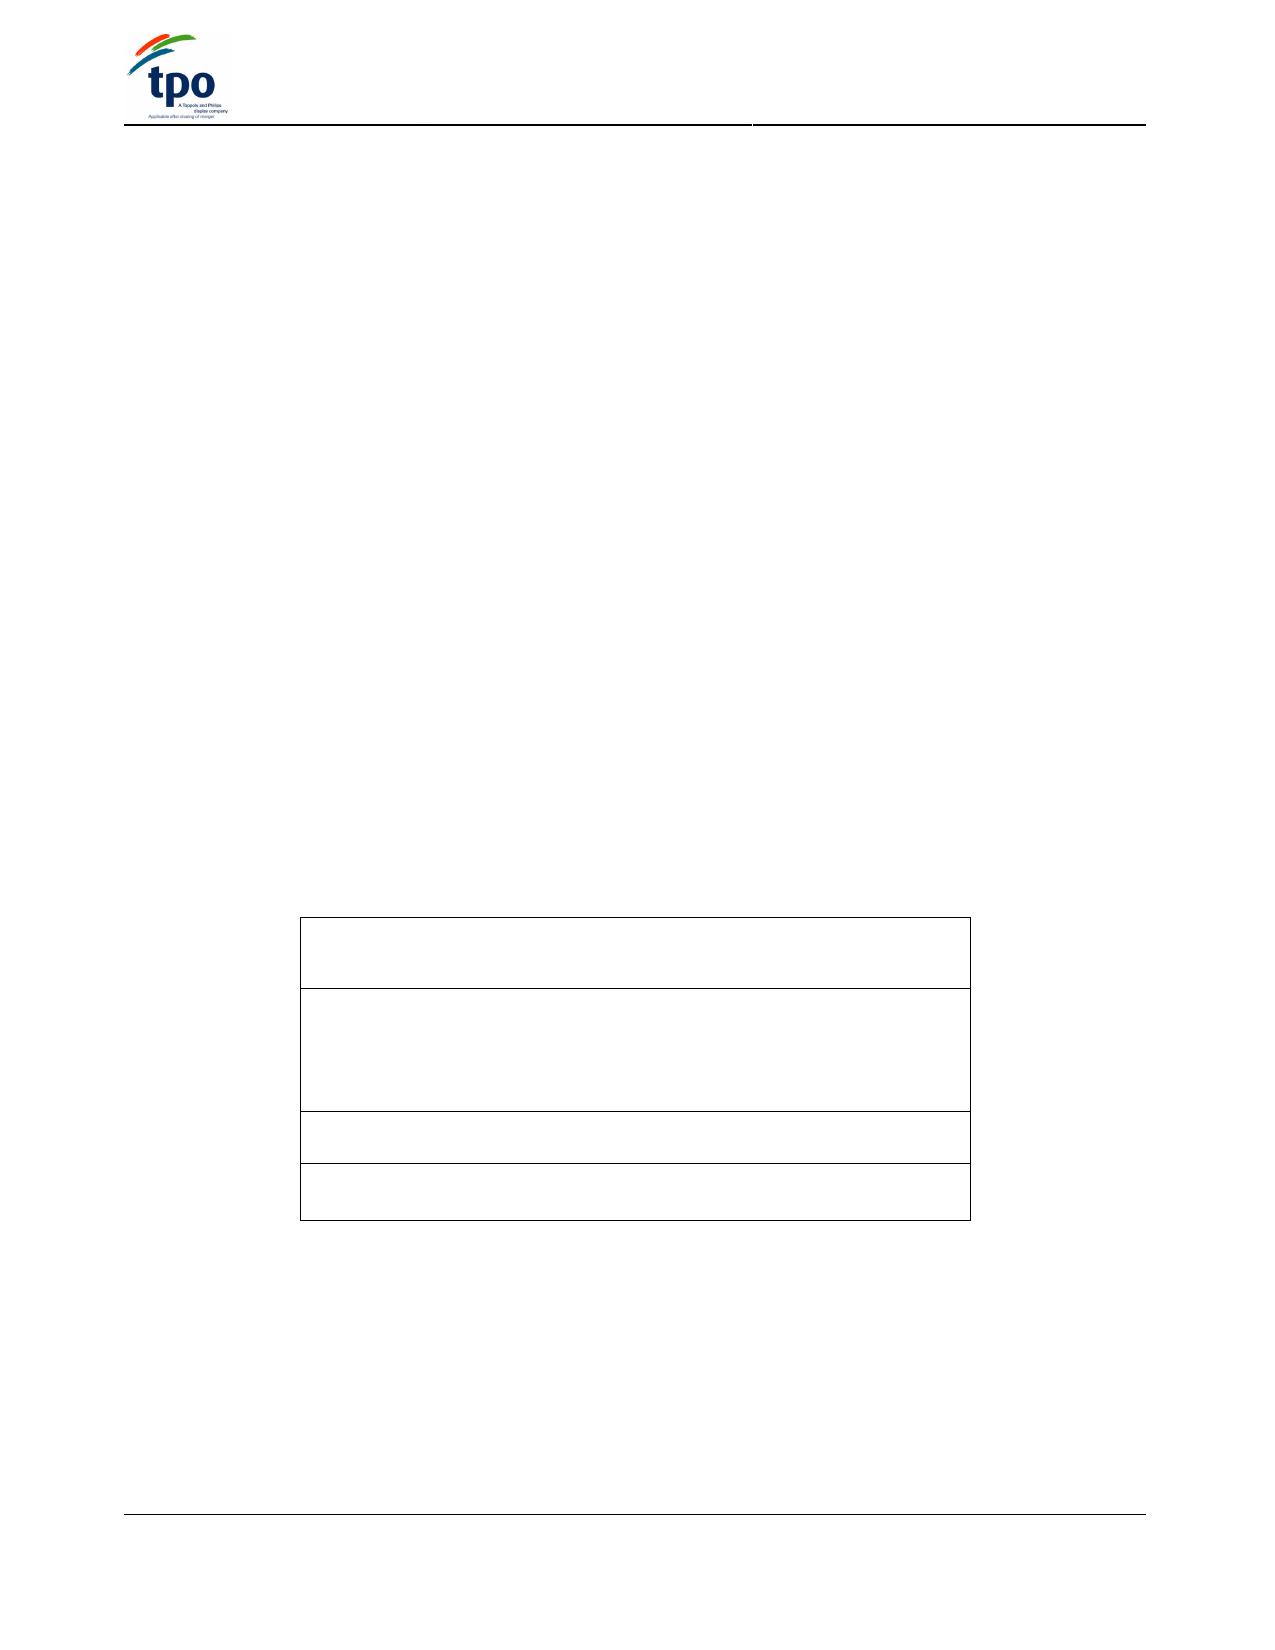 TD0028TTEE1 datasheet